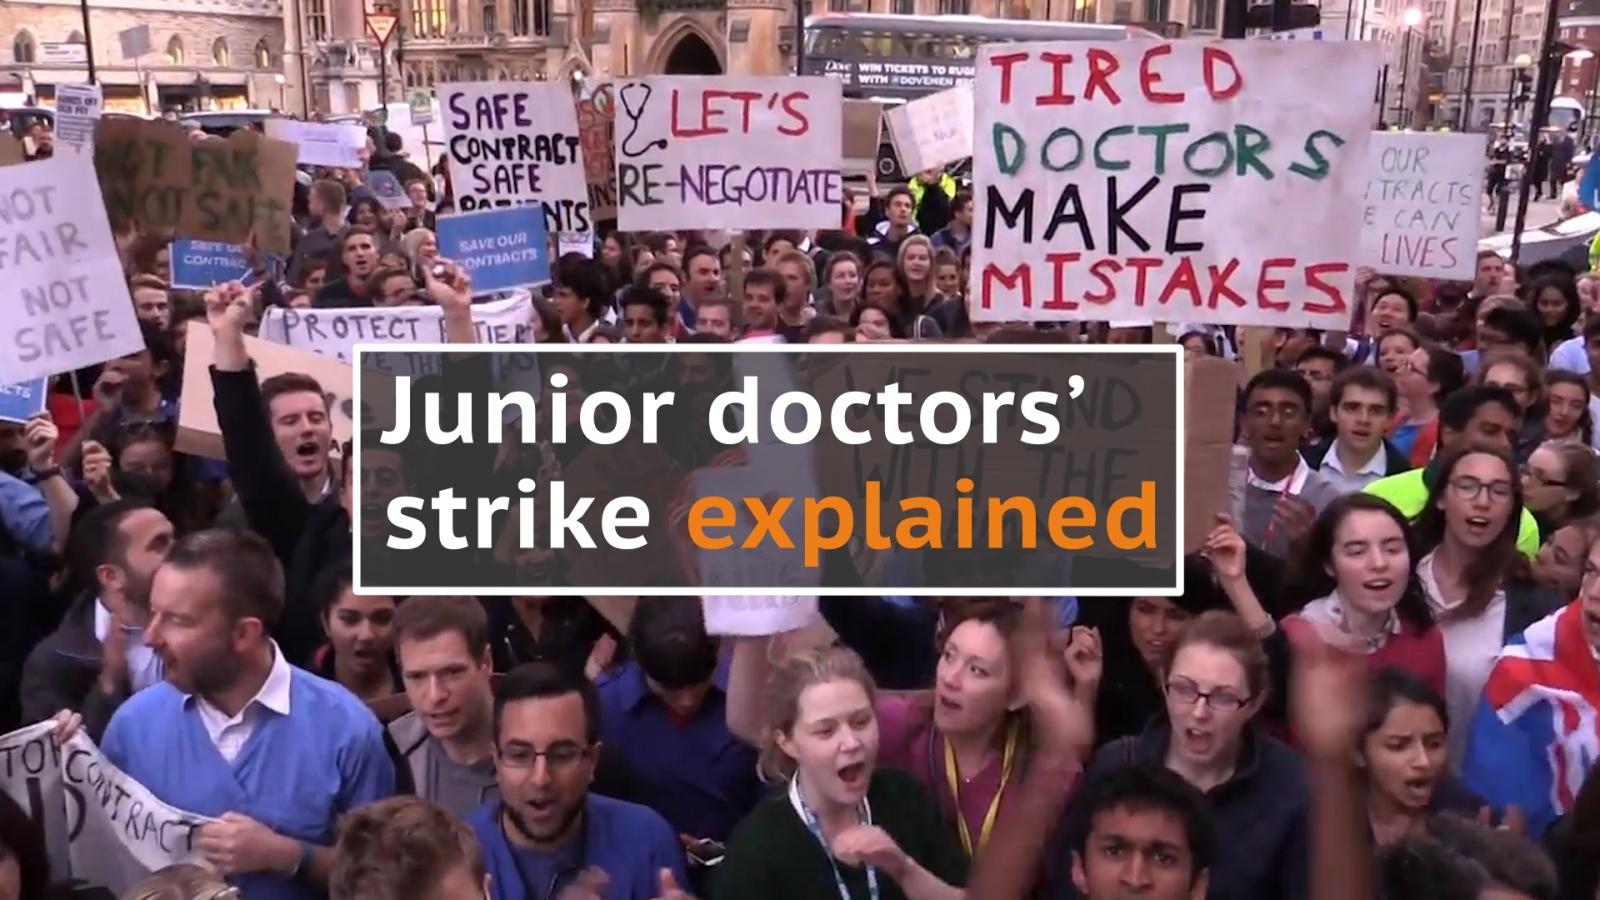 Junior doctors' strike explained